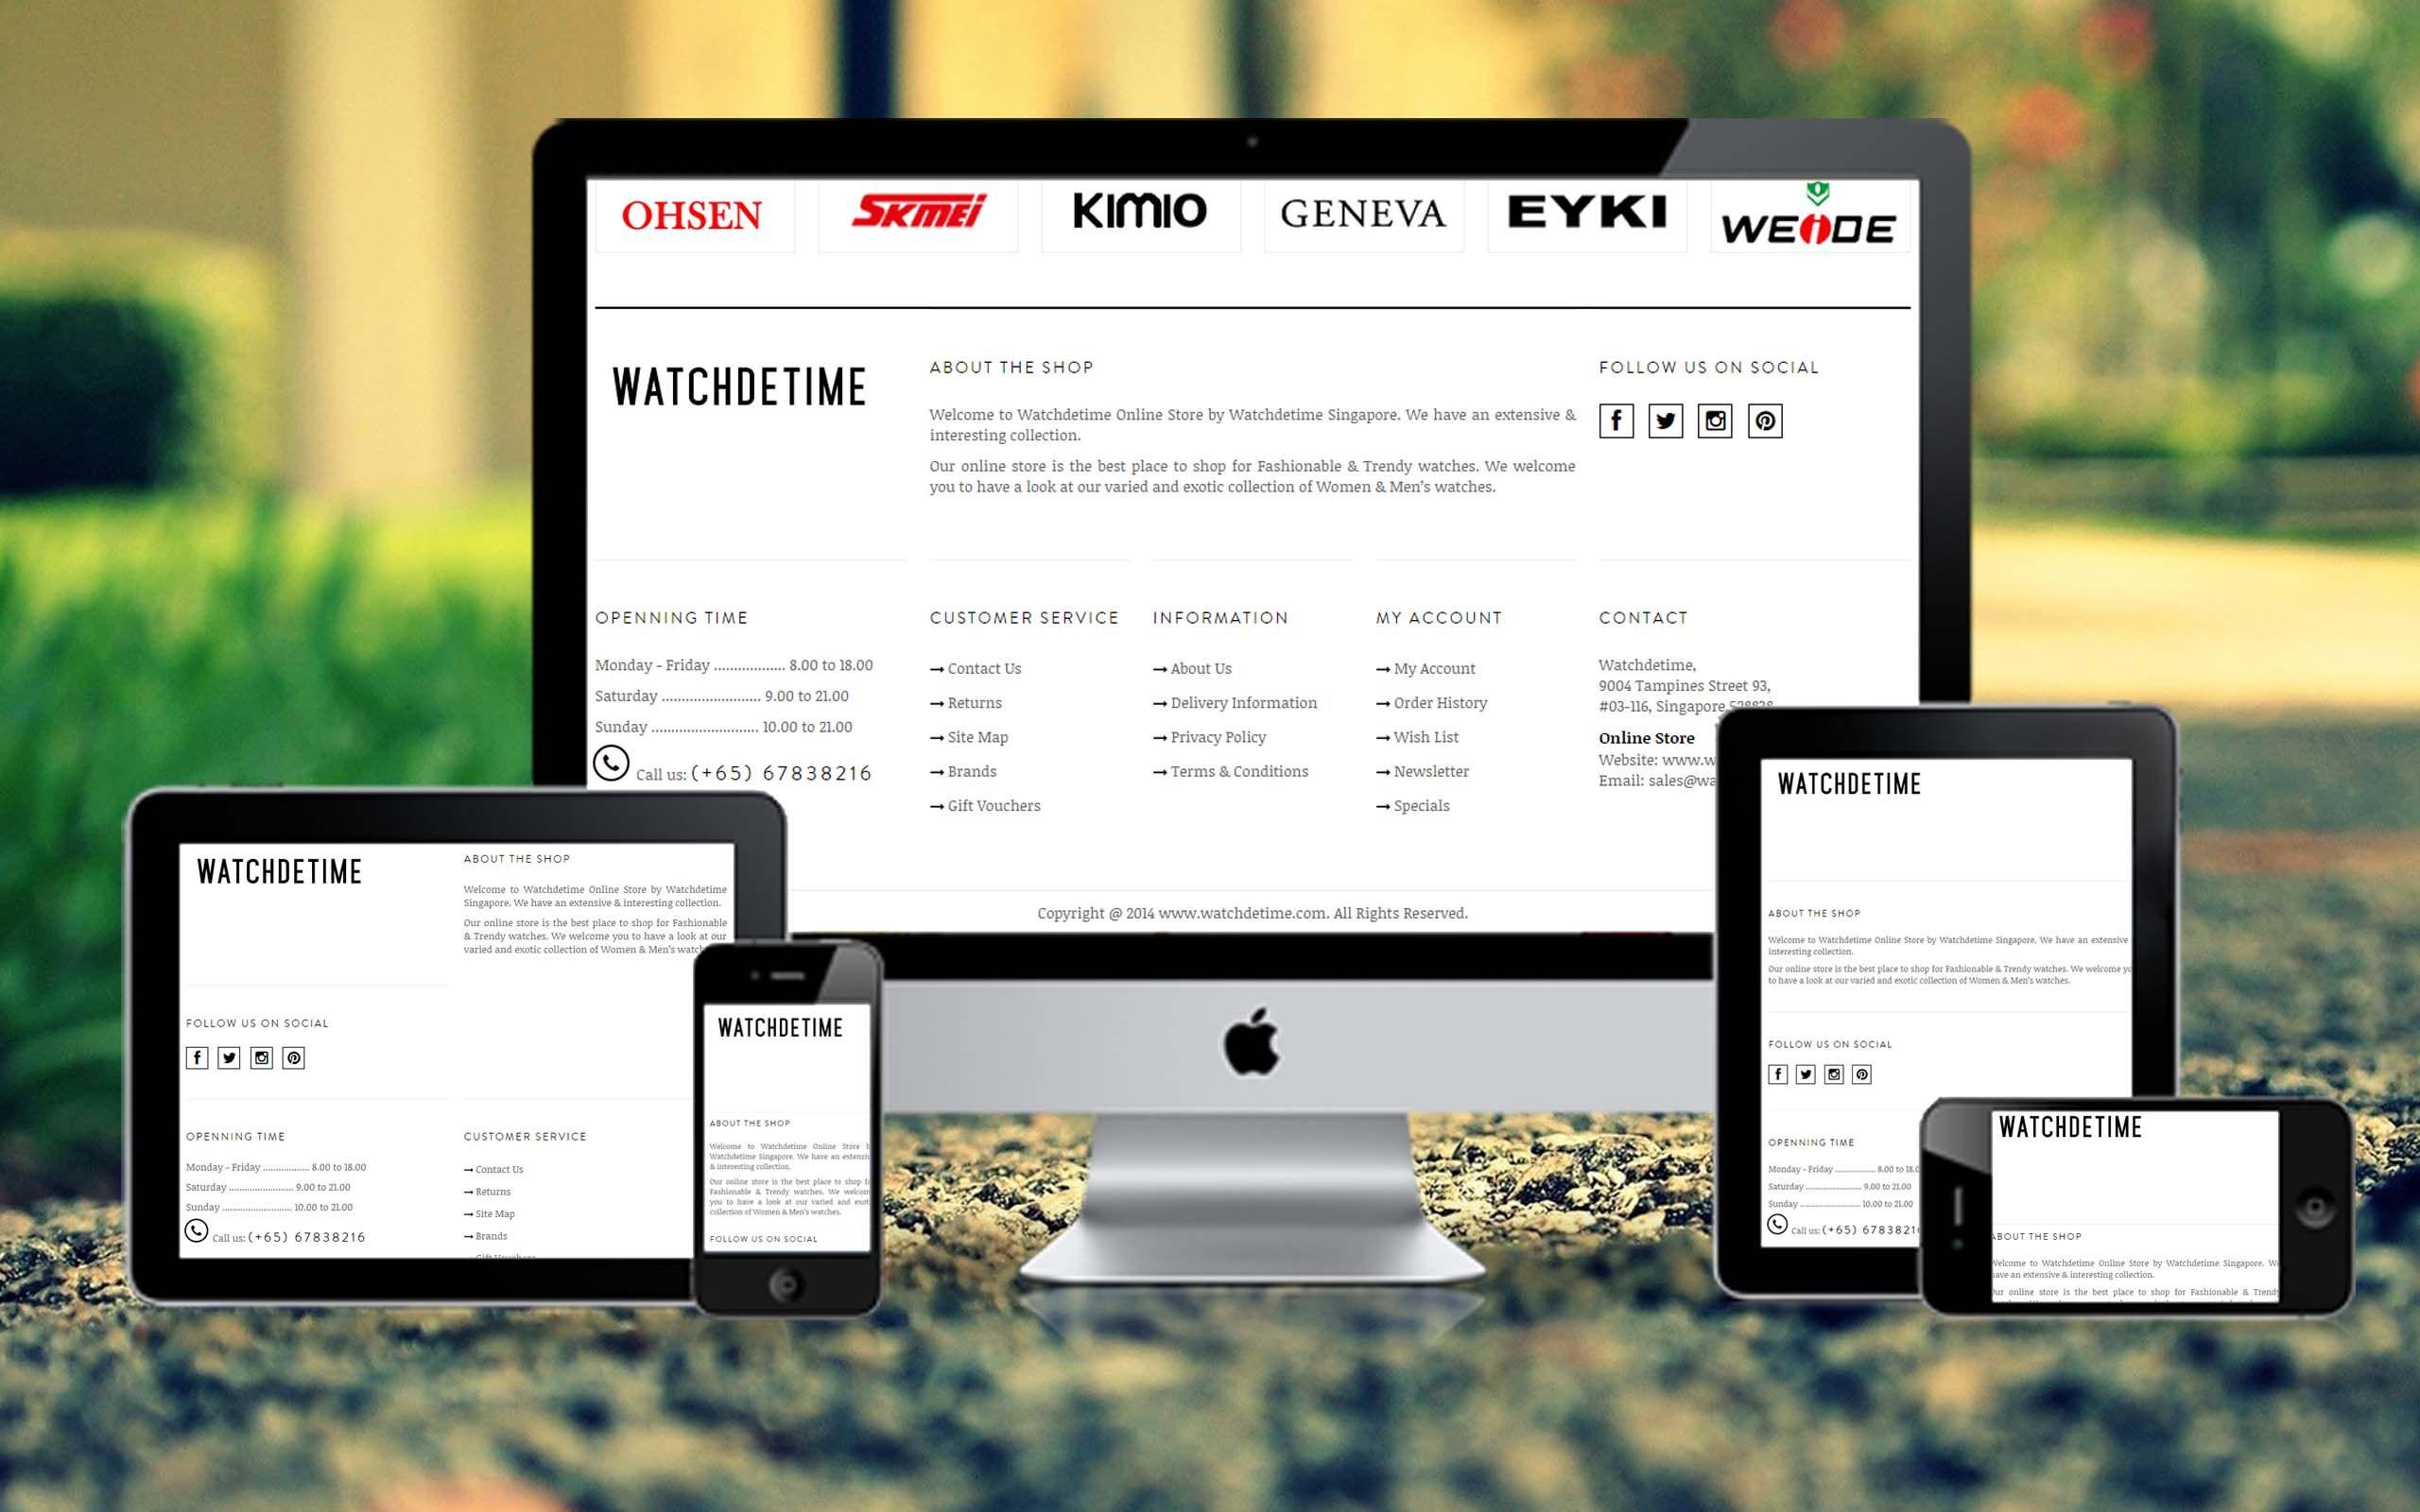 Http Www Cheapwebdesign Com Sg Index Php En Services Opencart Ecommerce Design Openca Web Development Design Corporate Website Design Branding Website Design